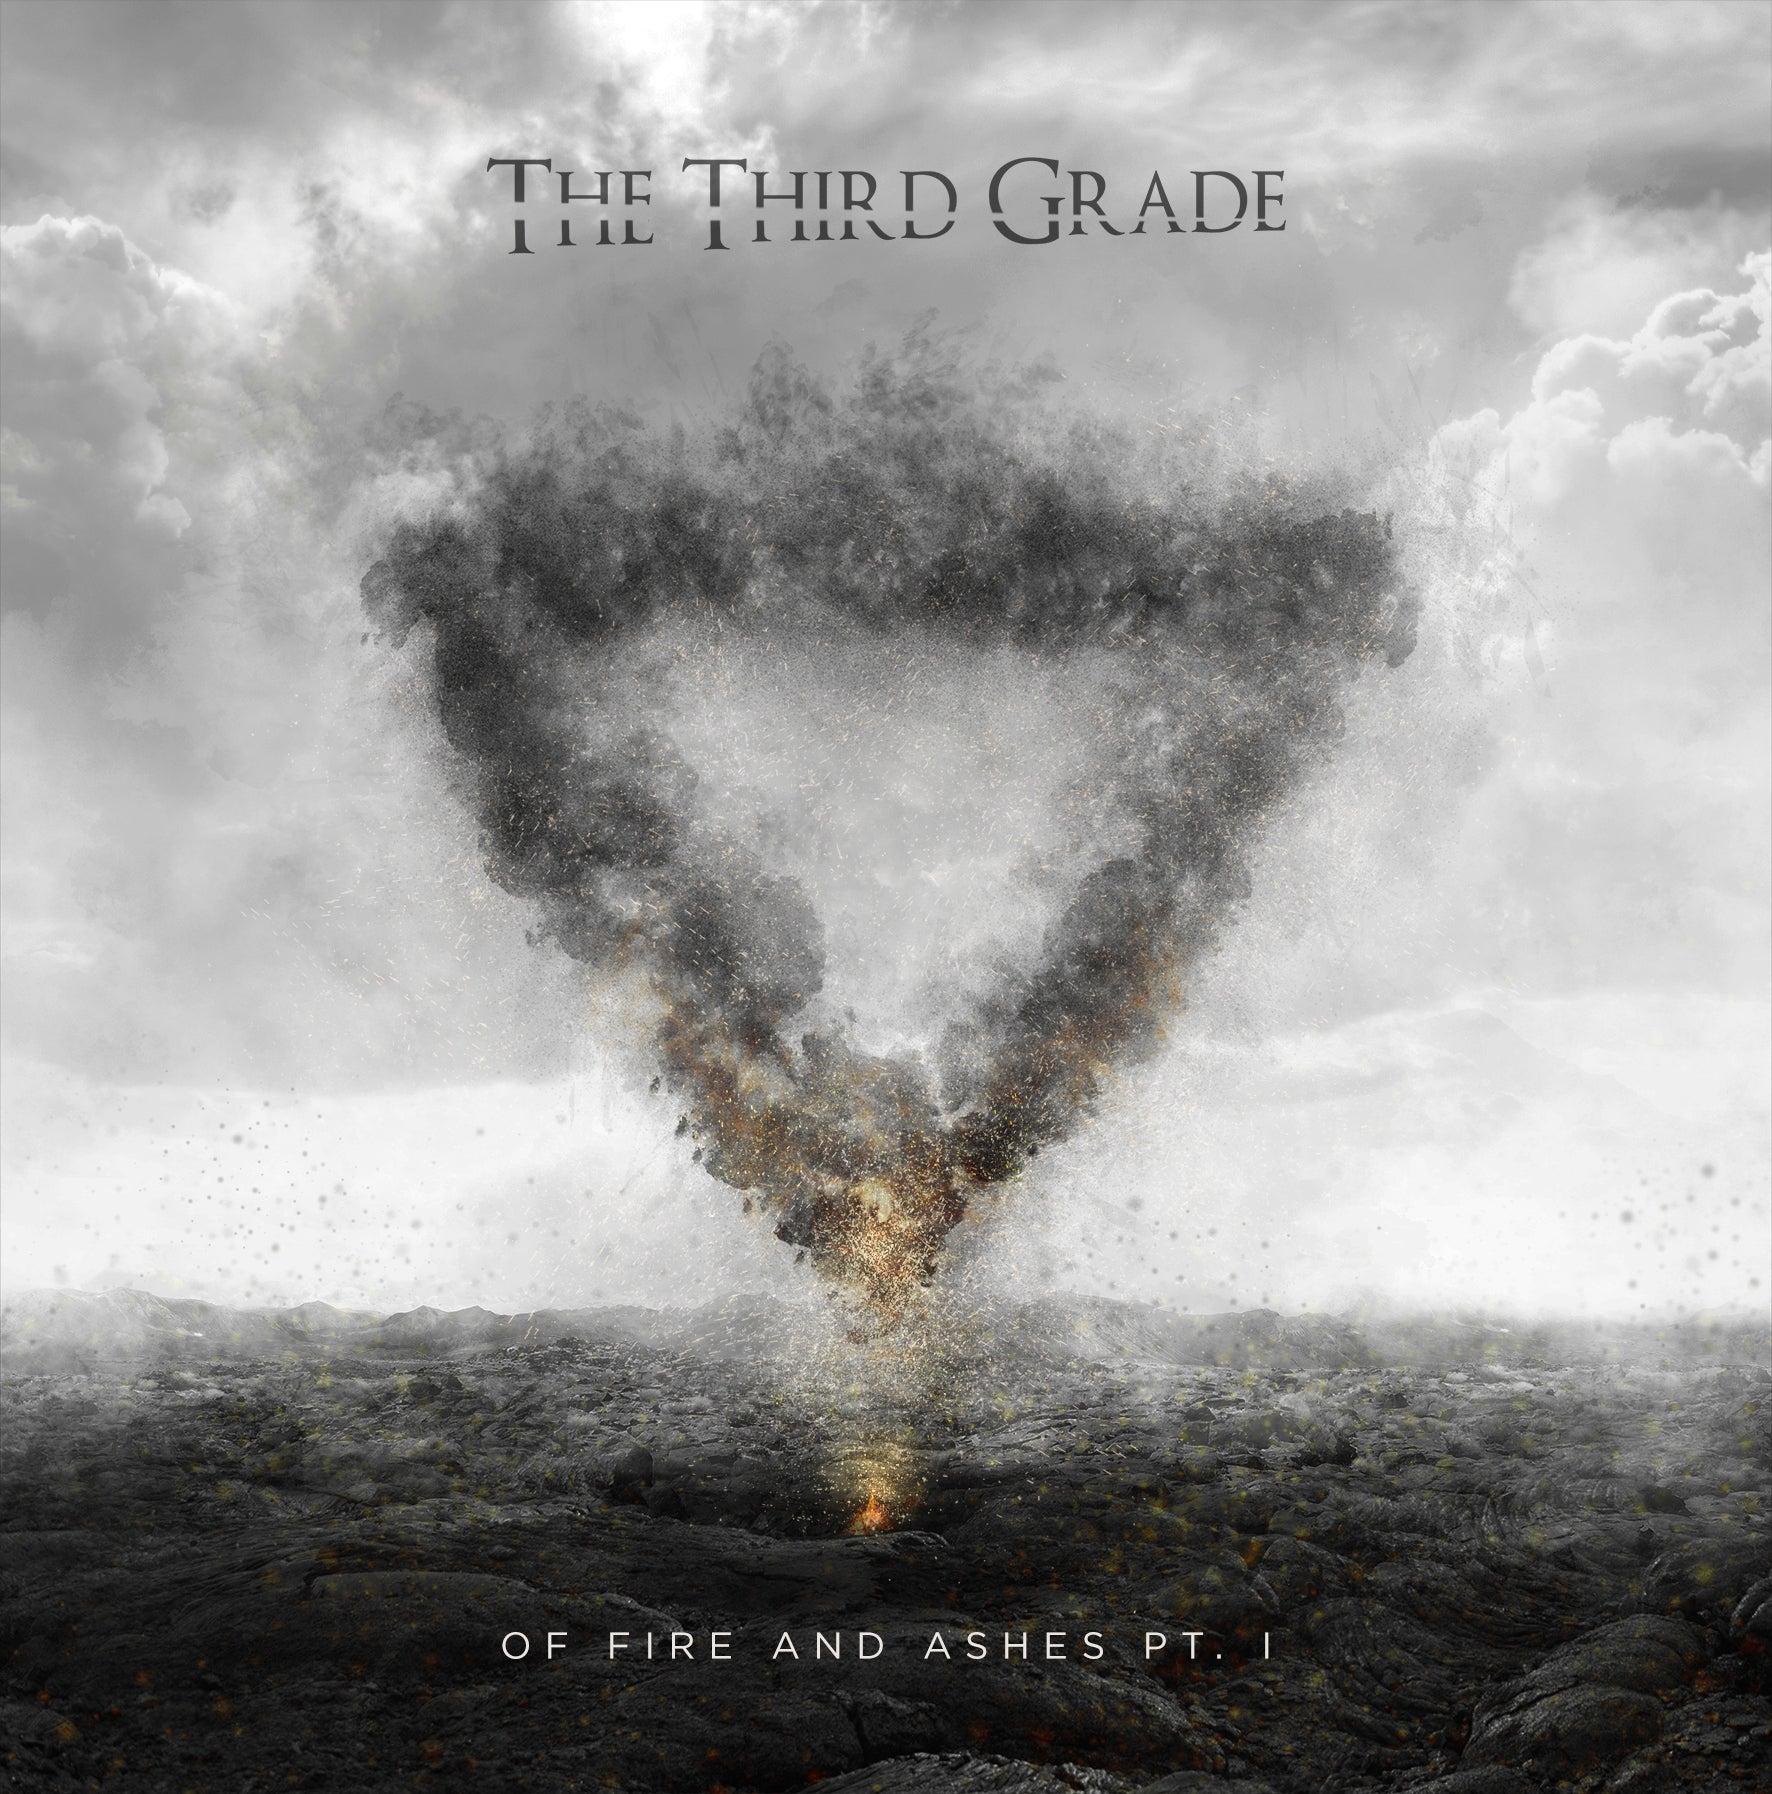 The Third Grade